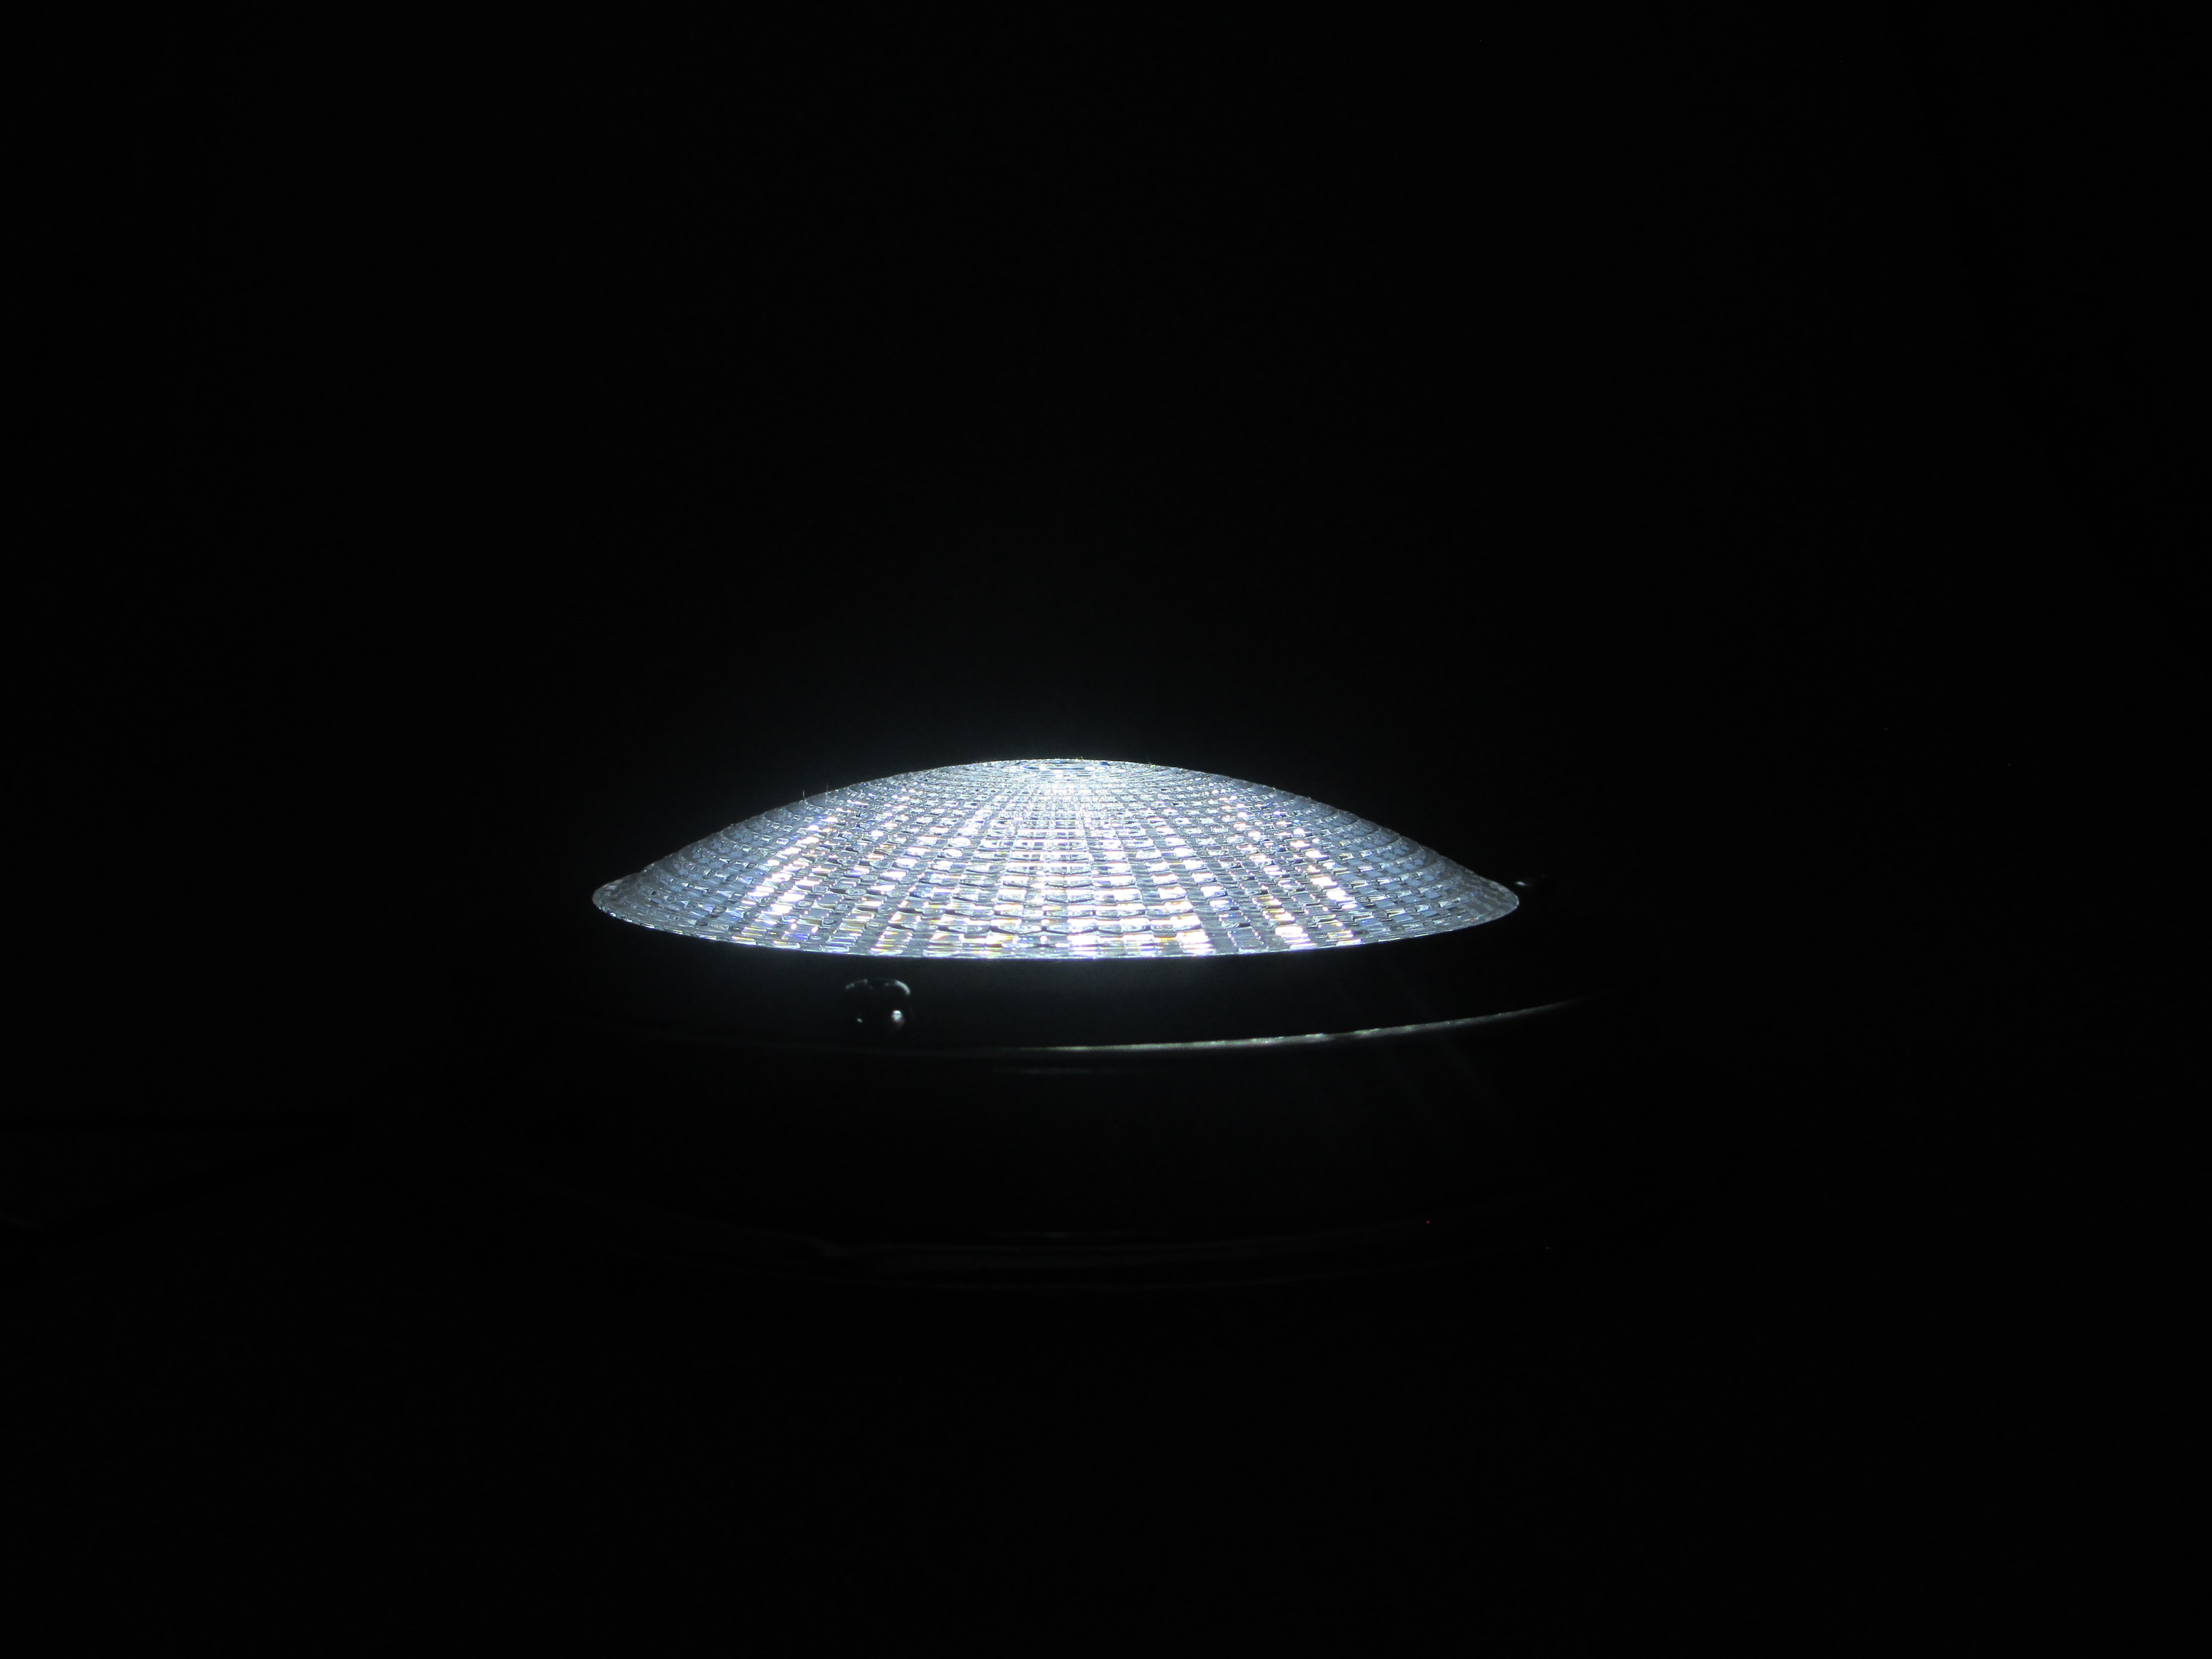 "PACTRADE MARINE 3/"" PC LENS BOAT CAR RV LED CEILING//CABIN//DOME LIGHT SS 304 12 V"